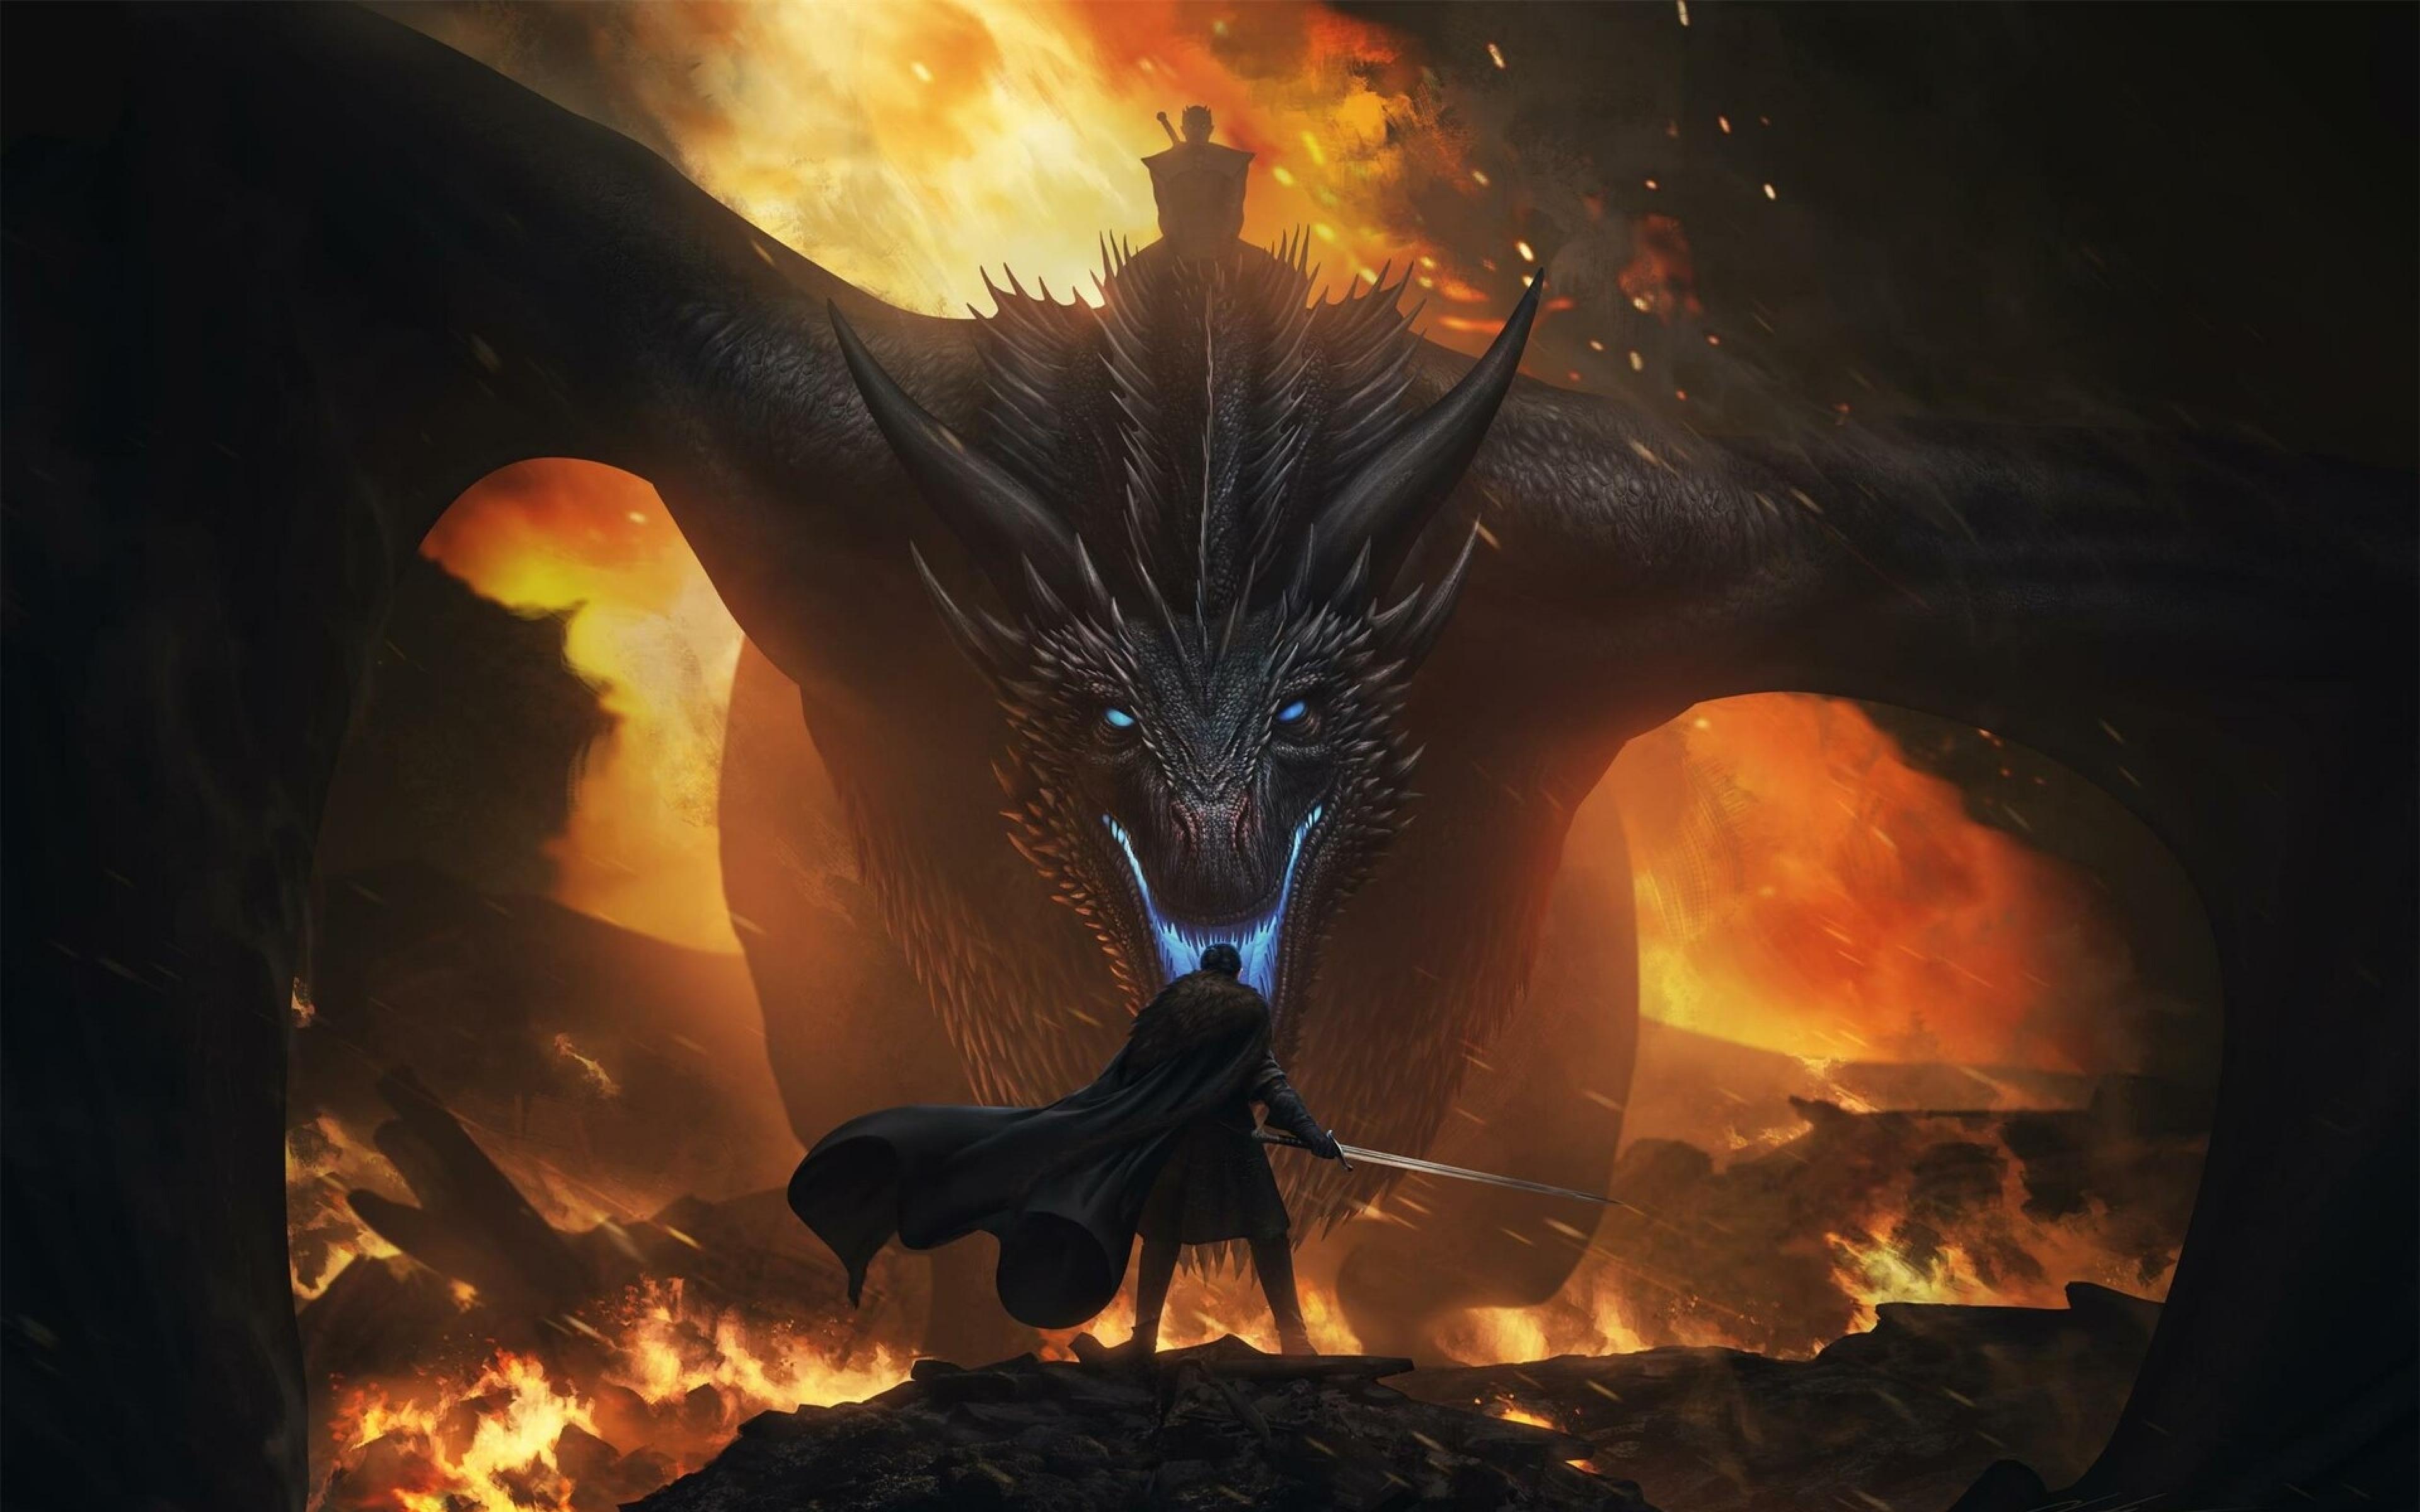 Hd Jon Snow Vs Night King Dragon 3840×2400 - Dragon Game Of Thrones Wallpaper 4k - HD Wallpaper